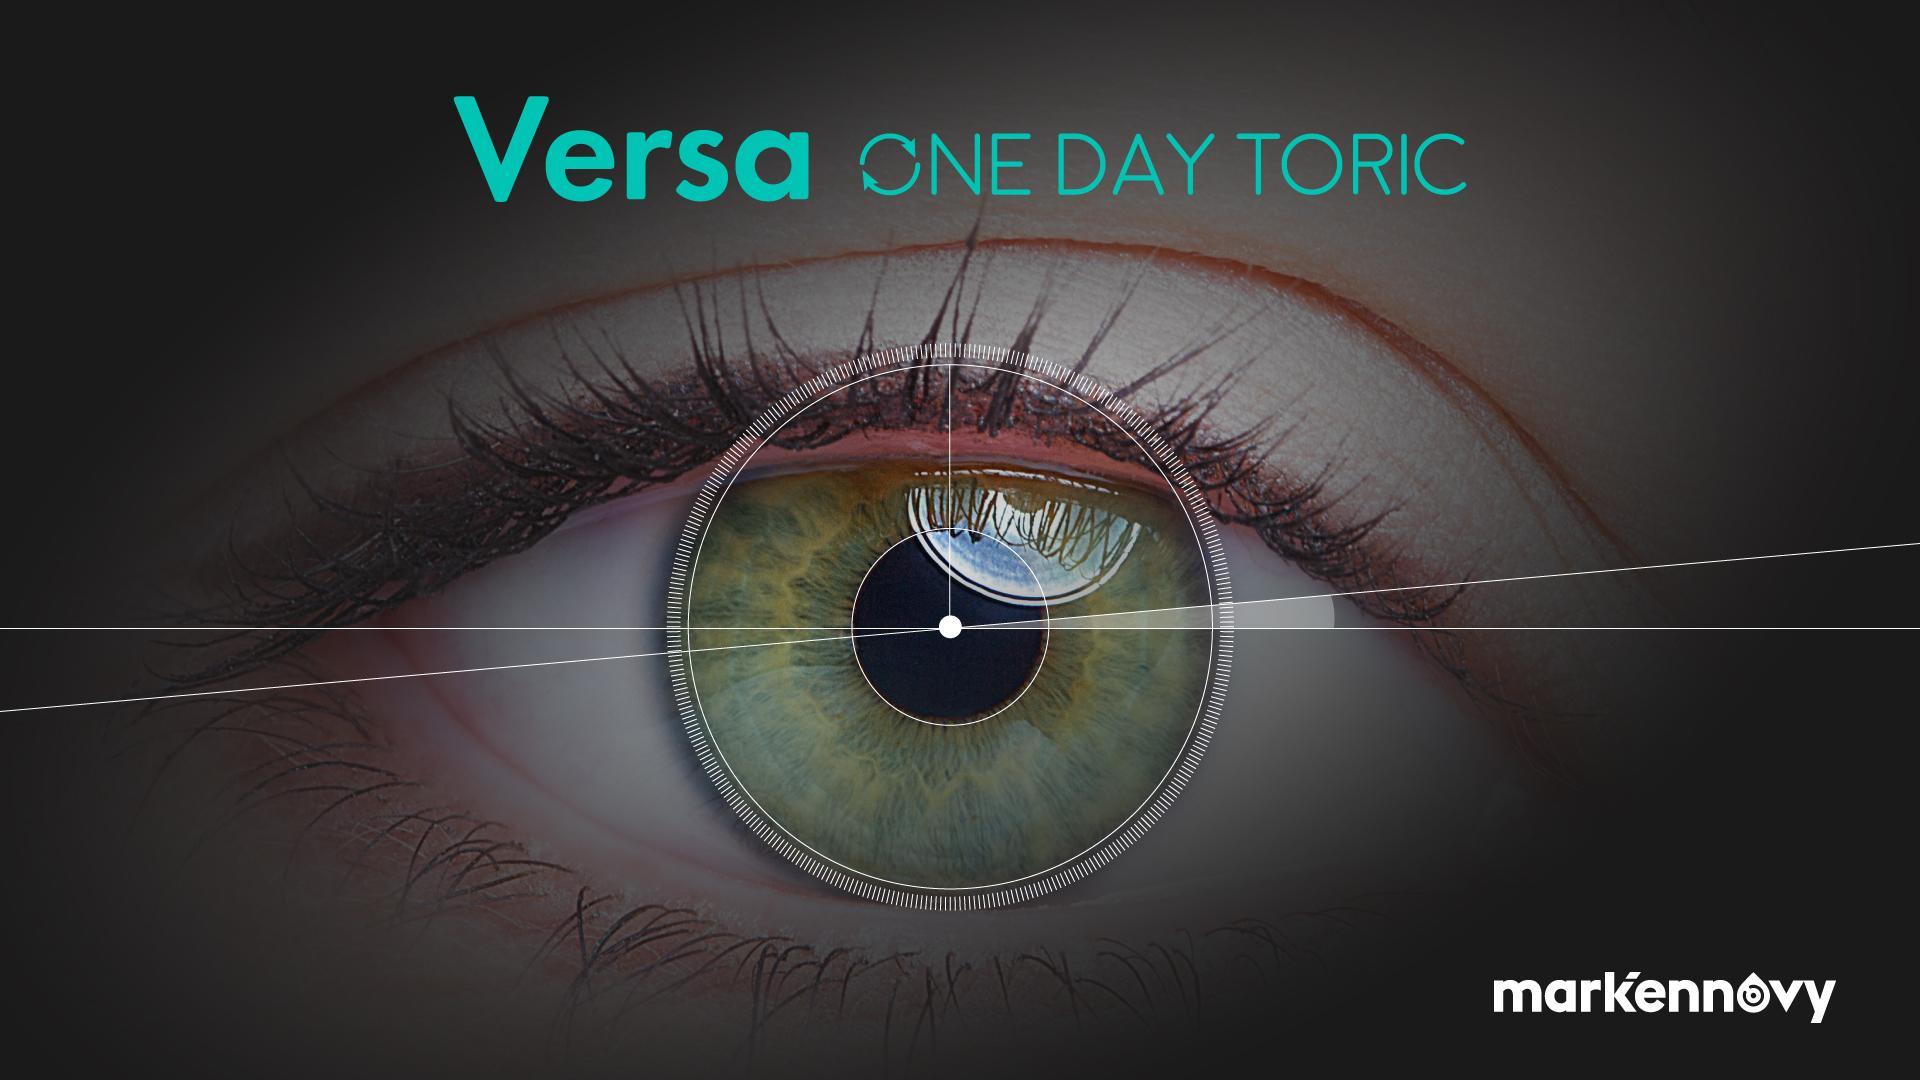 versa-one-day-toric